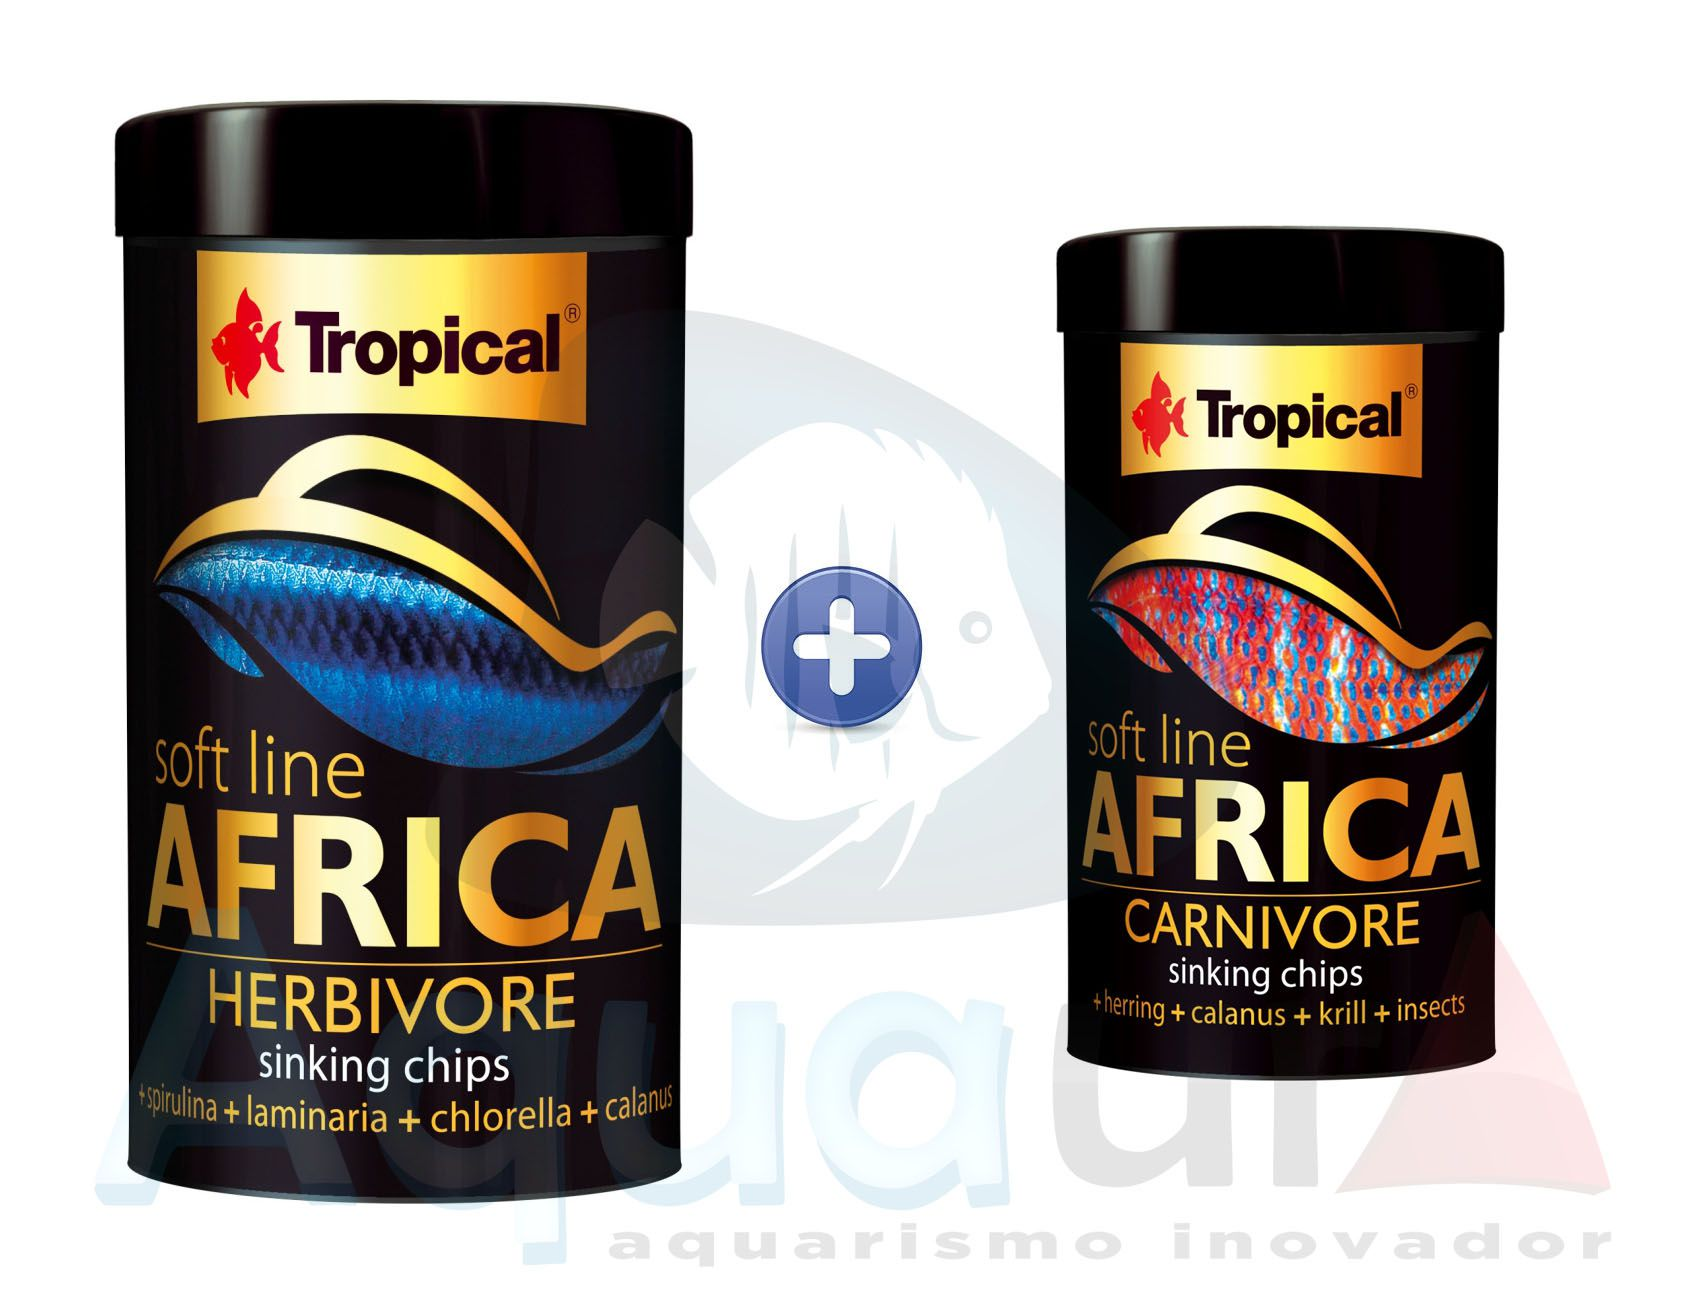 KIT RAÇÃO TROPICAL SOFT LINE AFRICA HERBIVORE 130 gr + CARNIVORE 52 gr